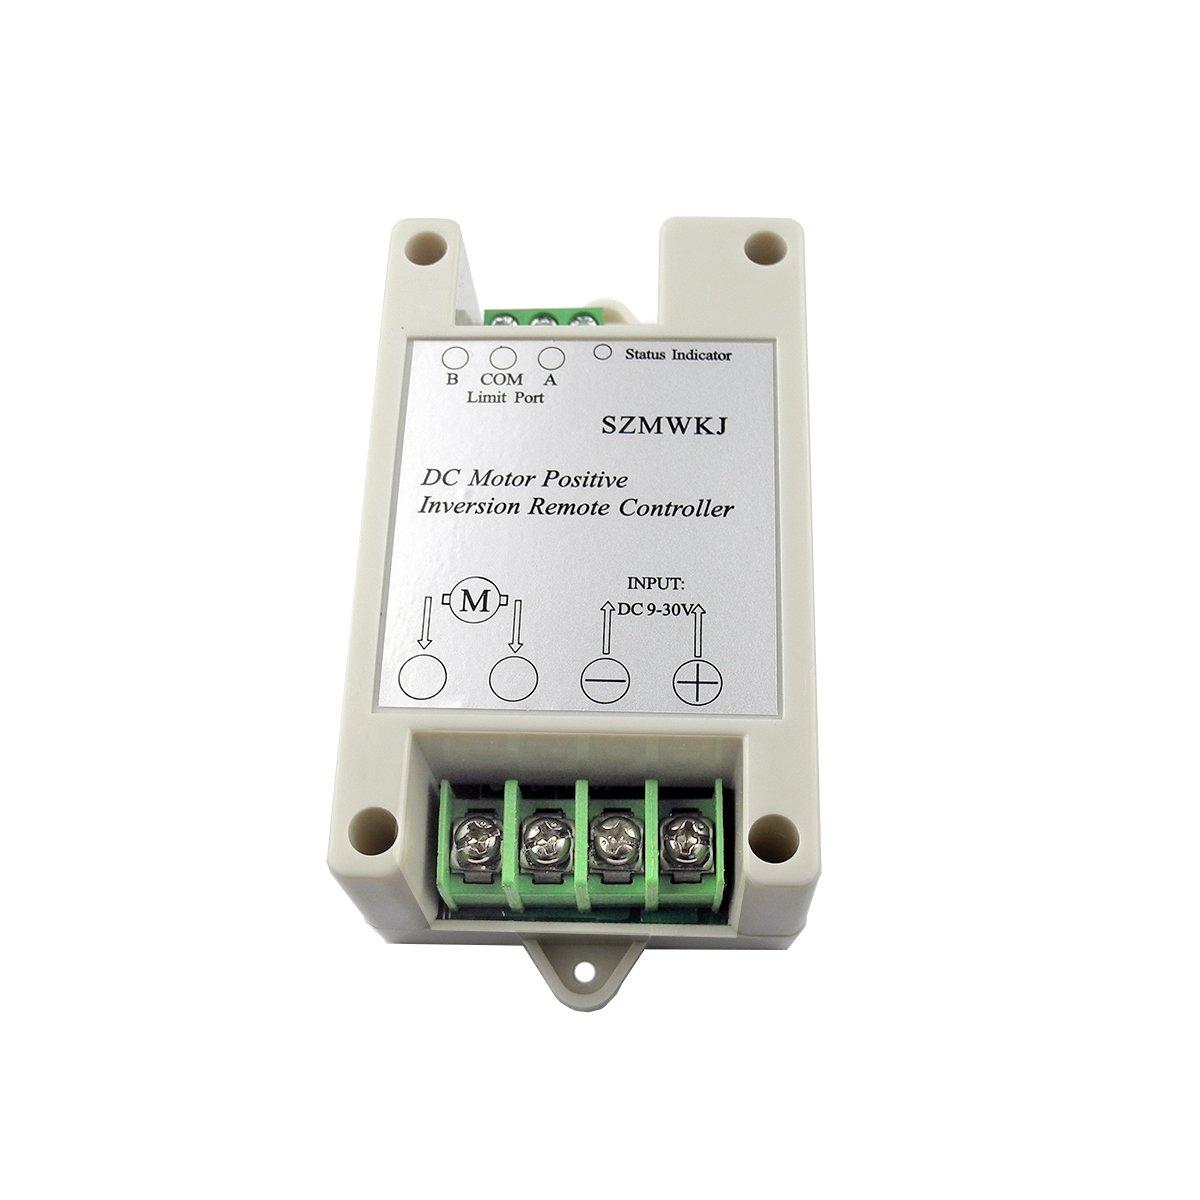 SZMWKJ Wireless Motor Controller Wireless Remote Positive